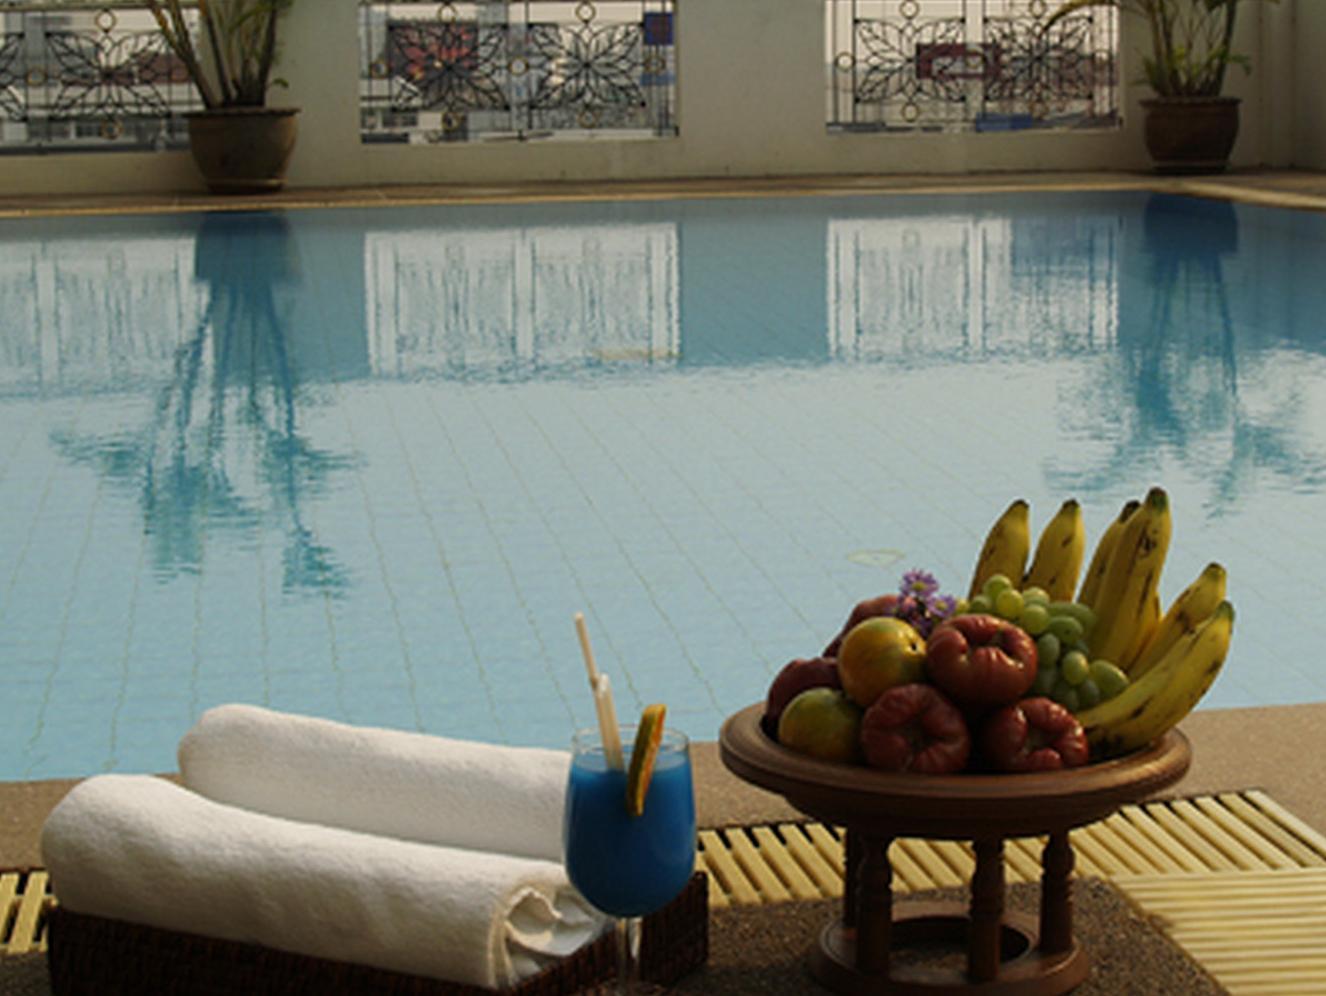 Royal Lanna Hotel โรงแรมรอยัล ล้านนา